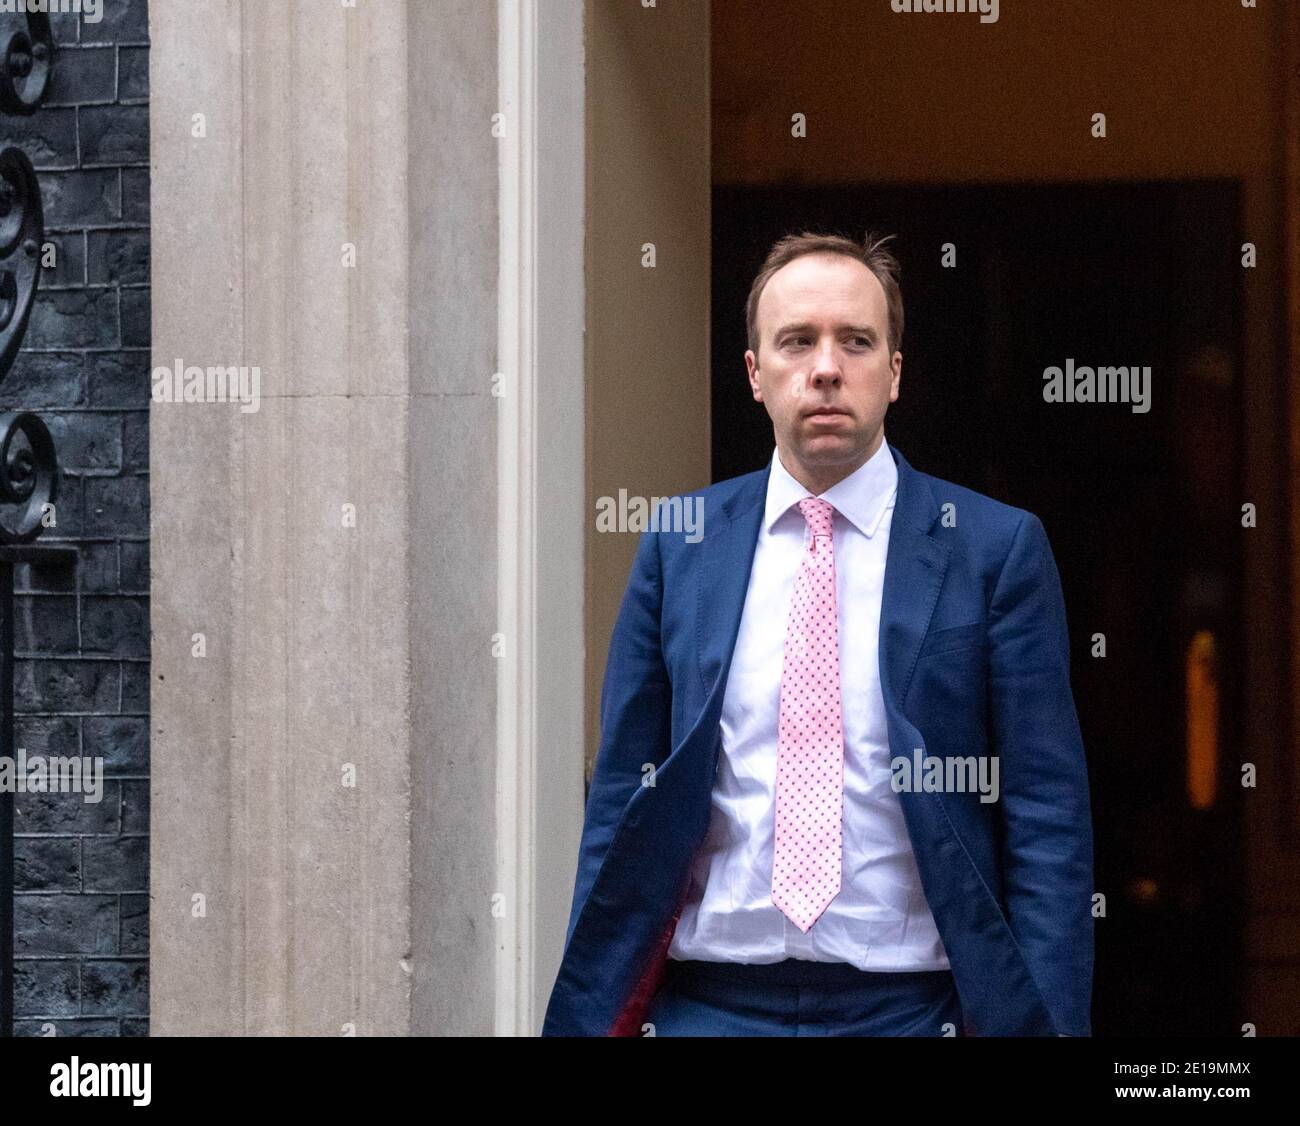 London, UK. 5th Jan, 2021. Matt Hancock, Health Secretary, leaves 10 Downing Streeet London. Credit: Ian Davidson/Alamy Live News Stock Photo